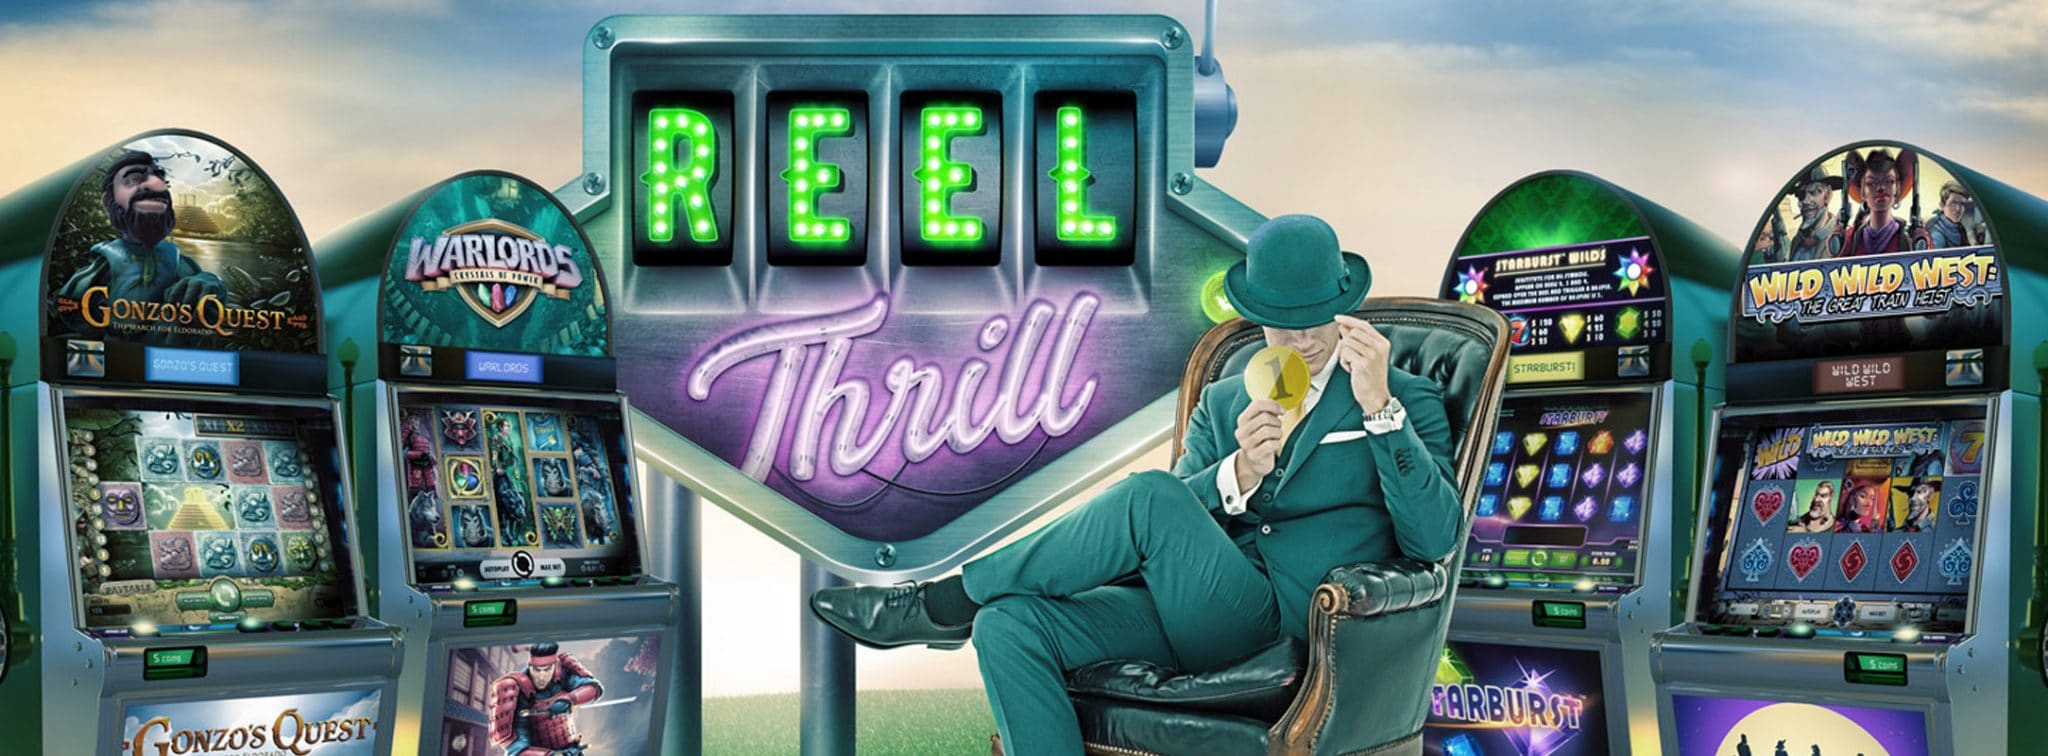 Bonus Spins are Falling at Mr Green Casino element03 - CasinoTop